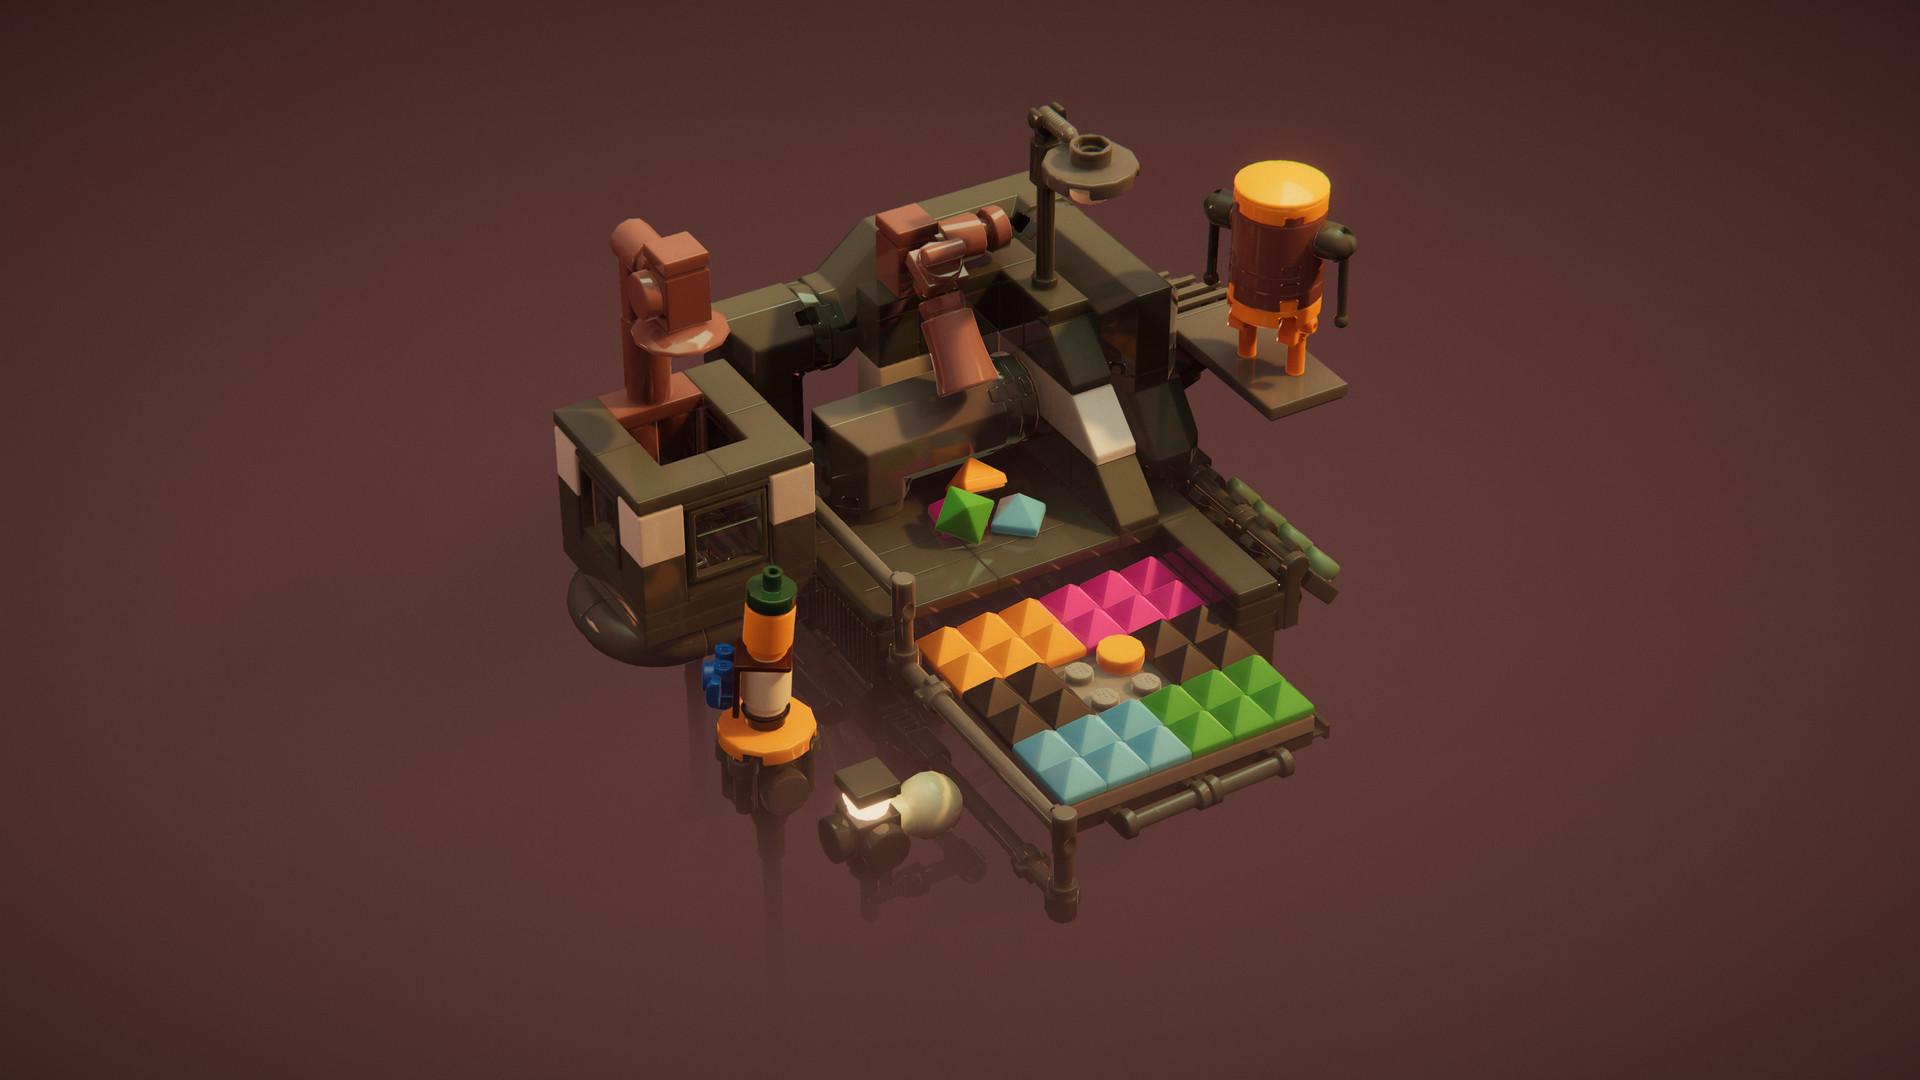 lego-builders-pc-screenshot-2